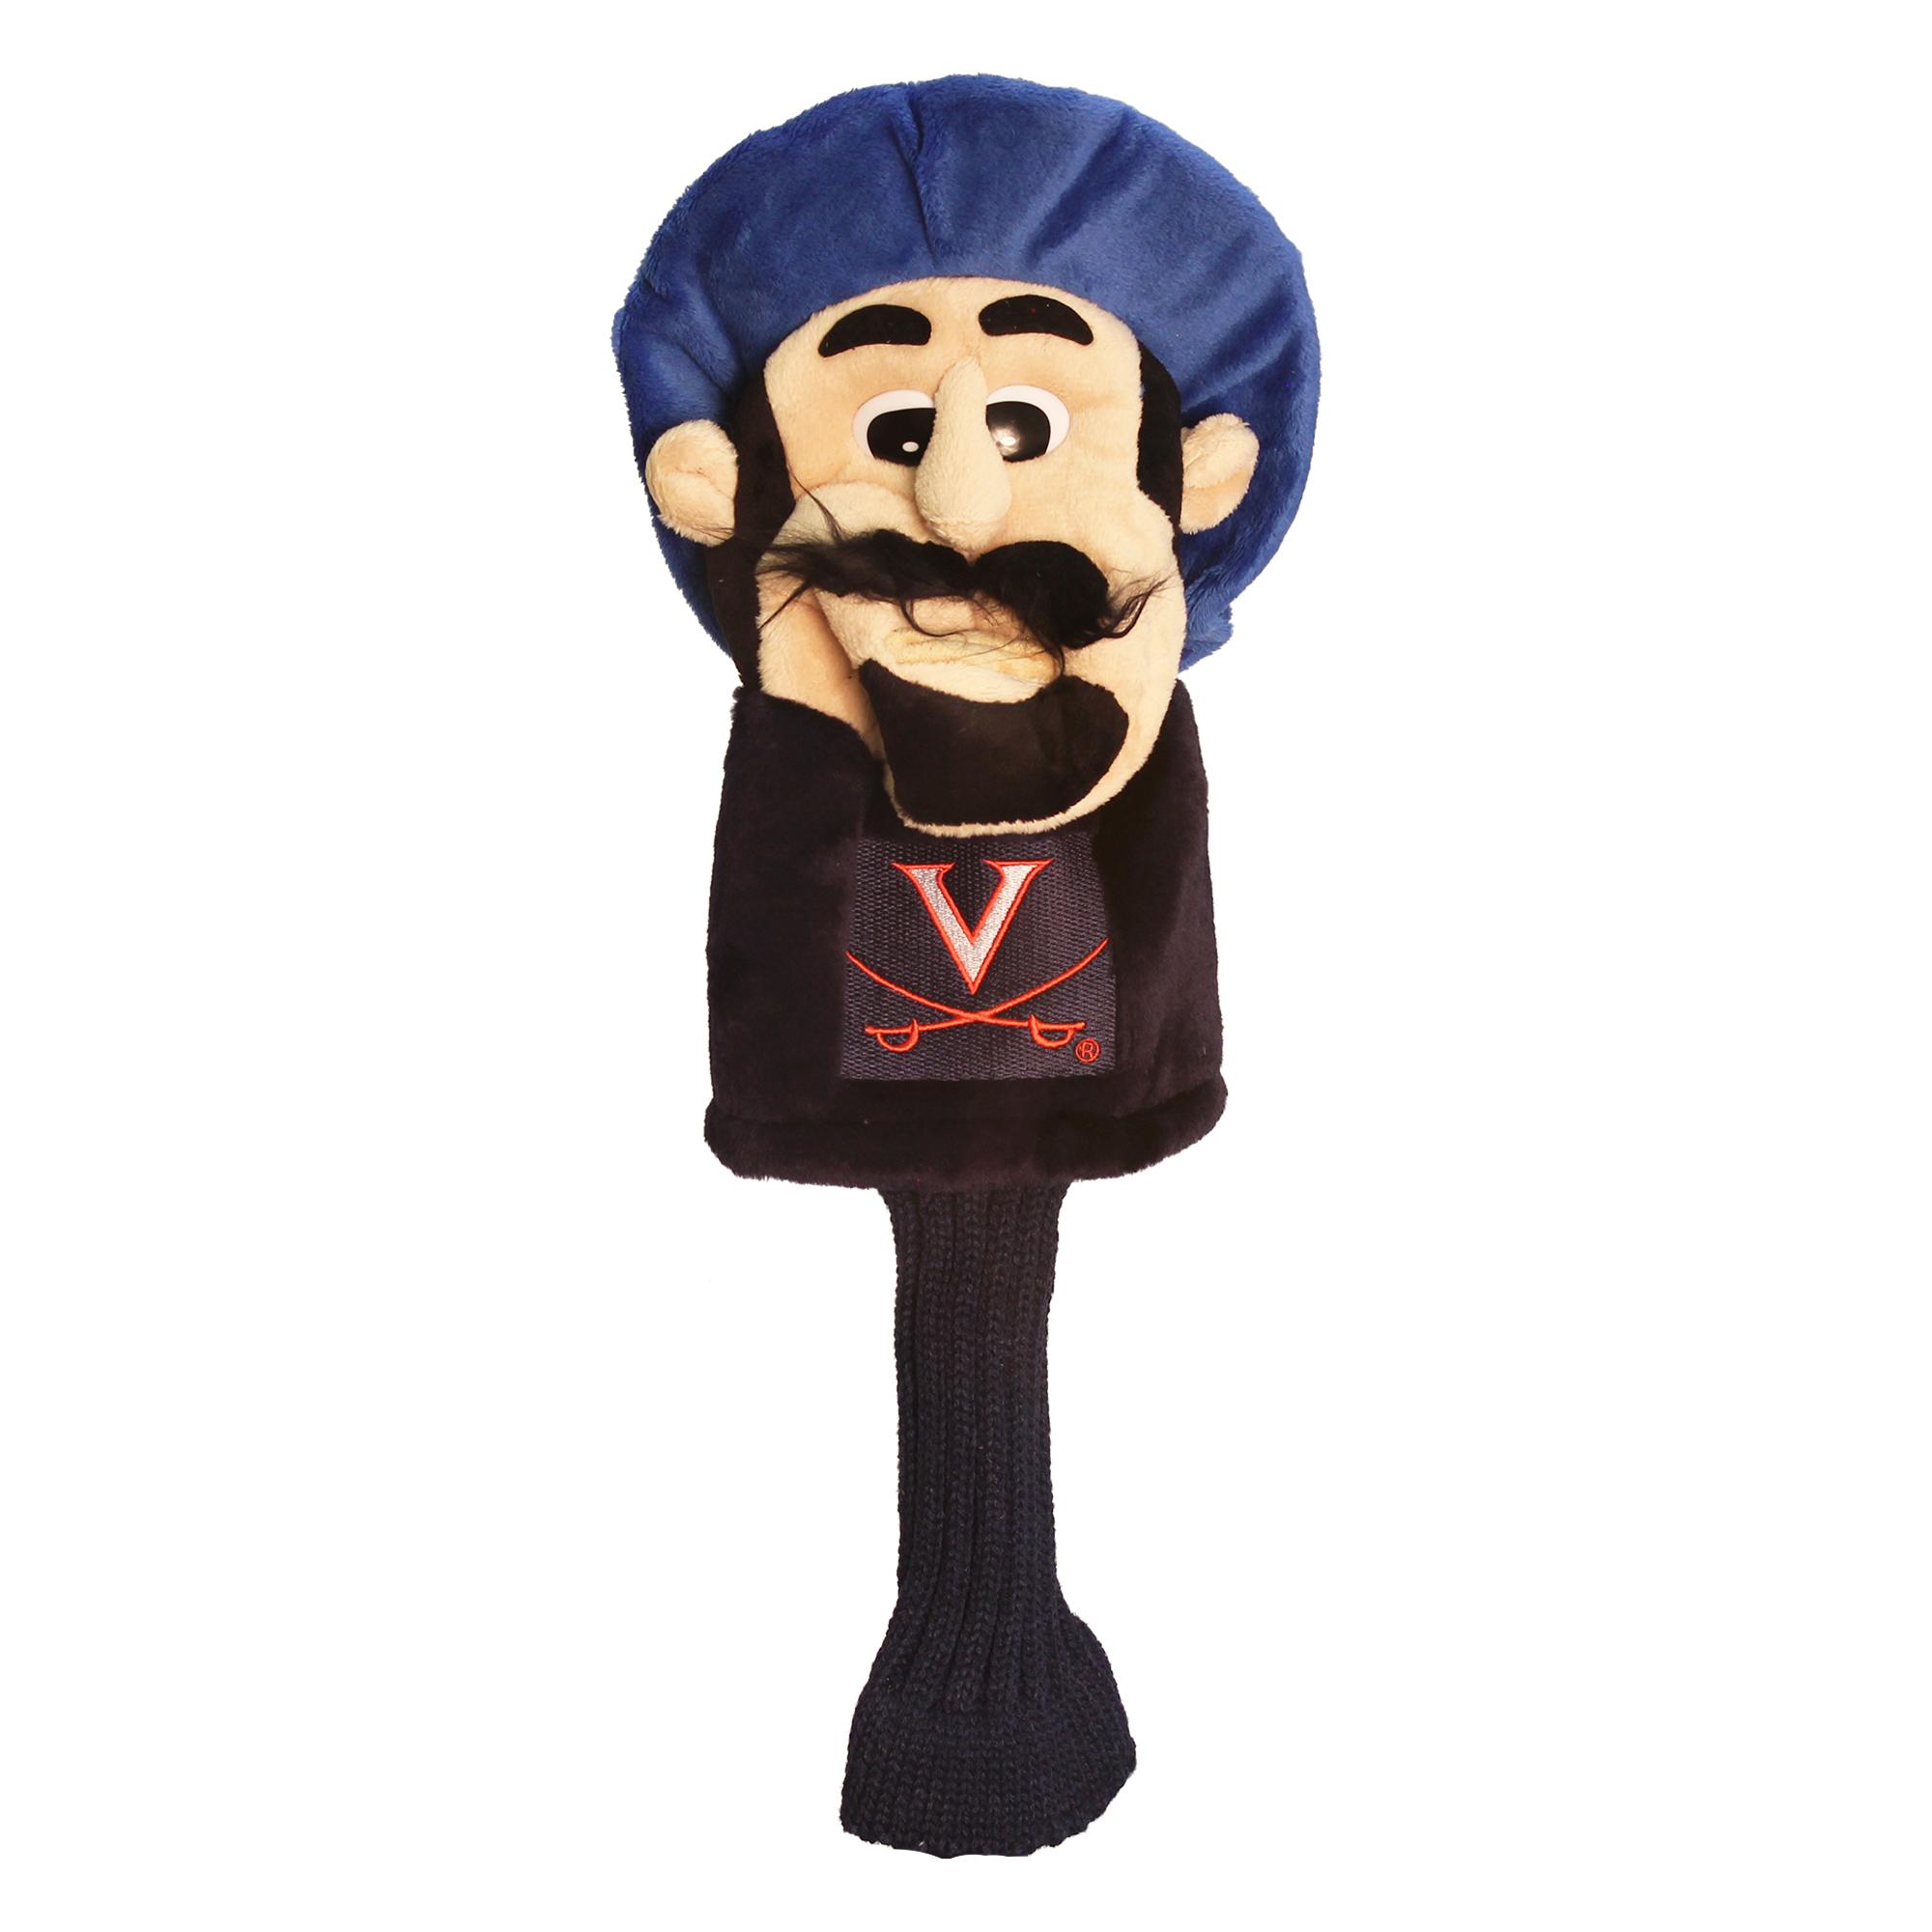 Virginia Cavalier Mascot Golf Headcover 3217